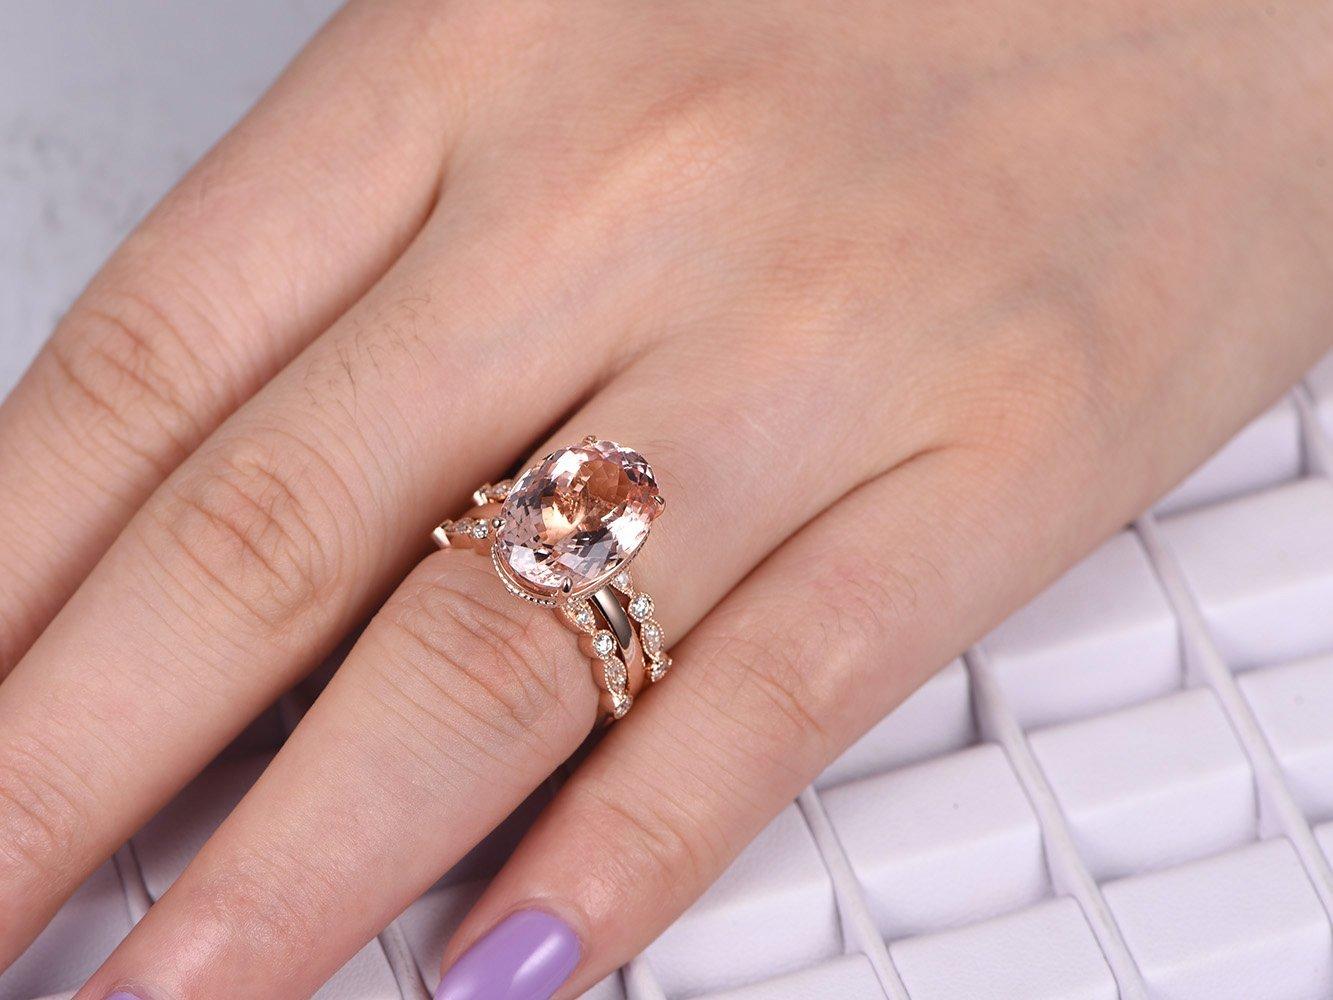 Amazon.com: Oval Morganite Engagement Ring Set Pave Diamond Wedding ...